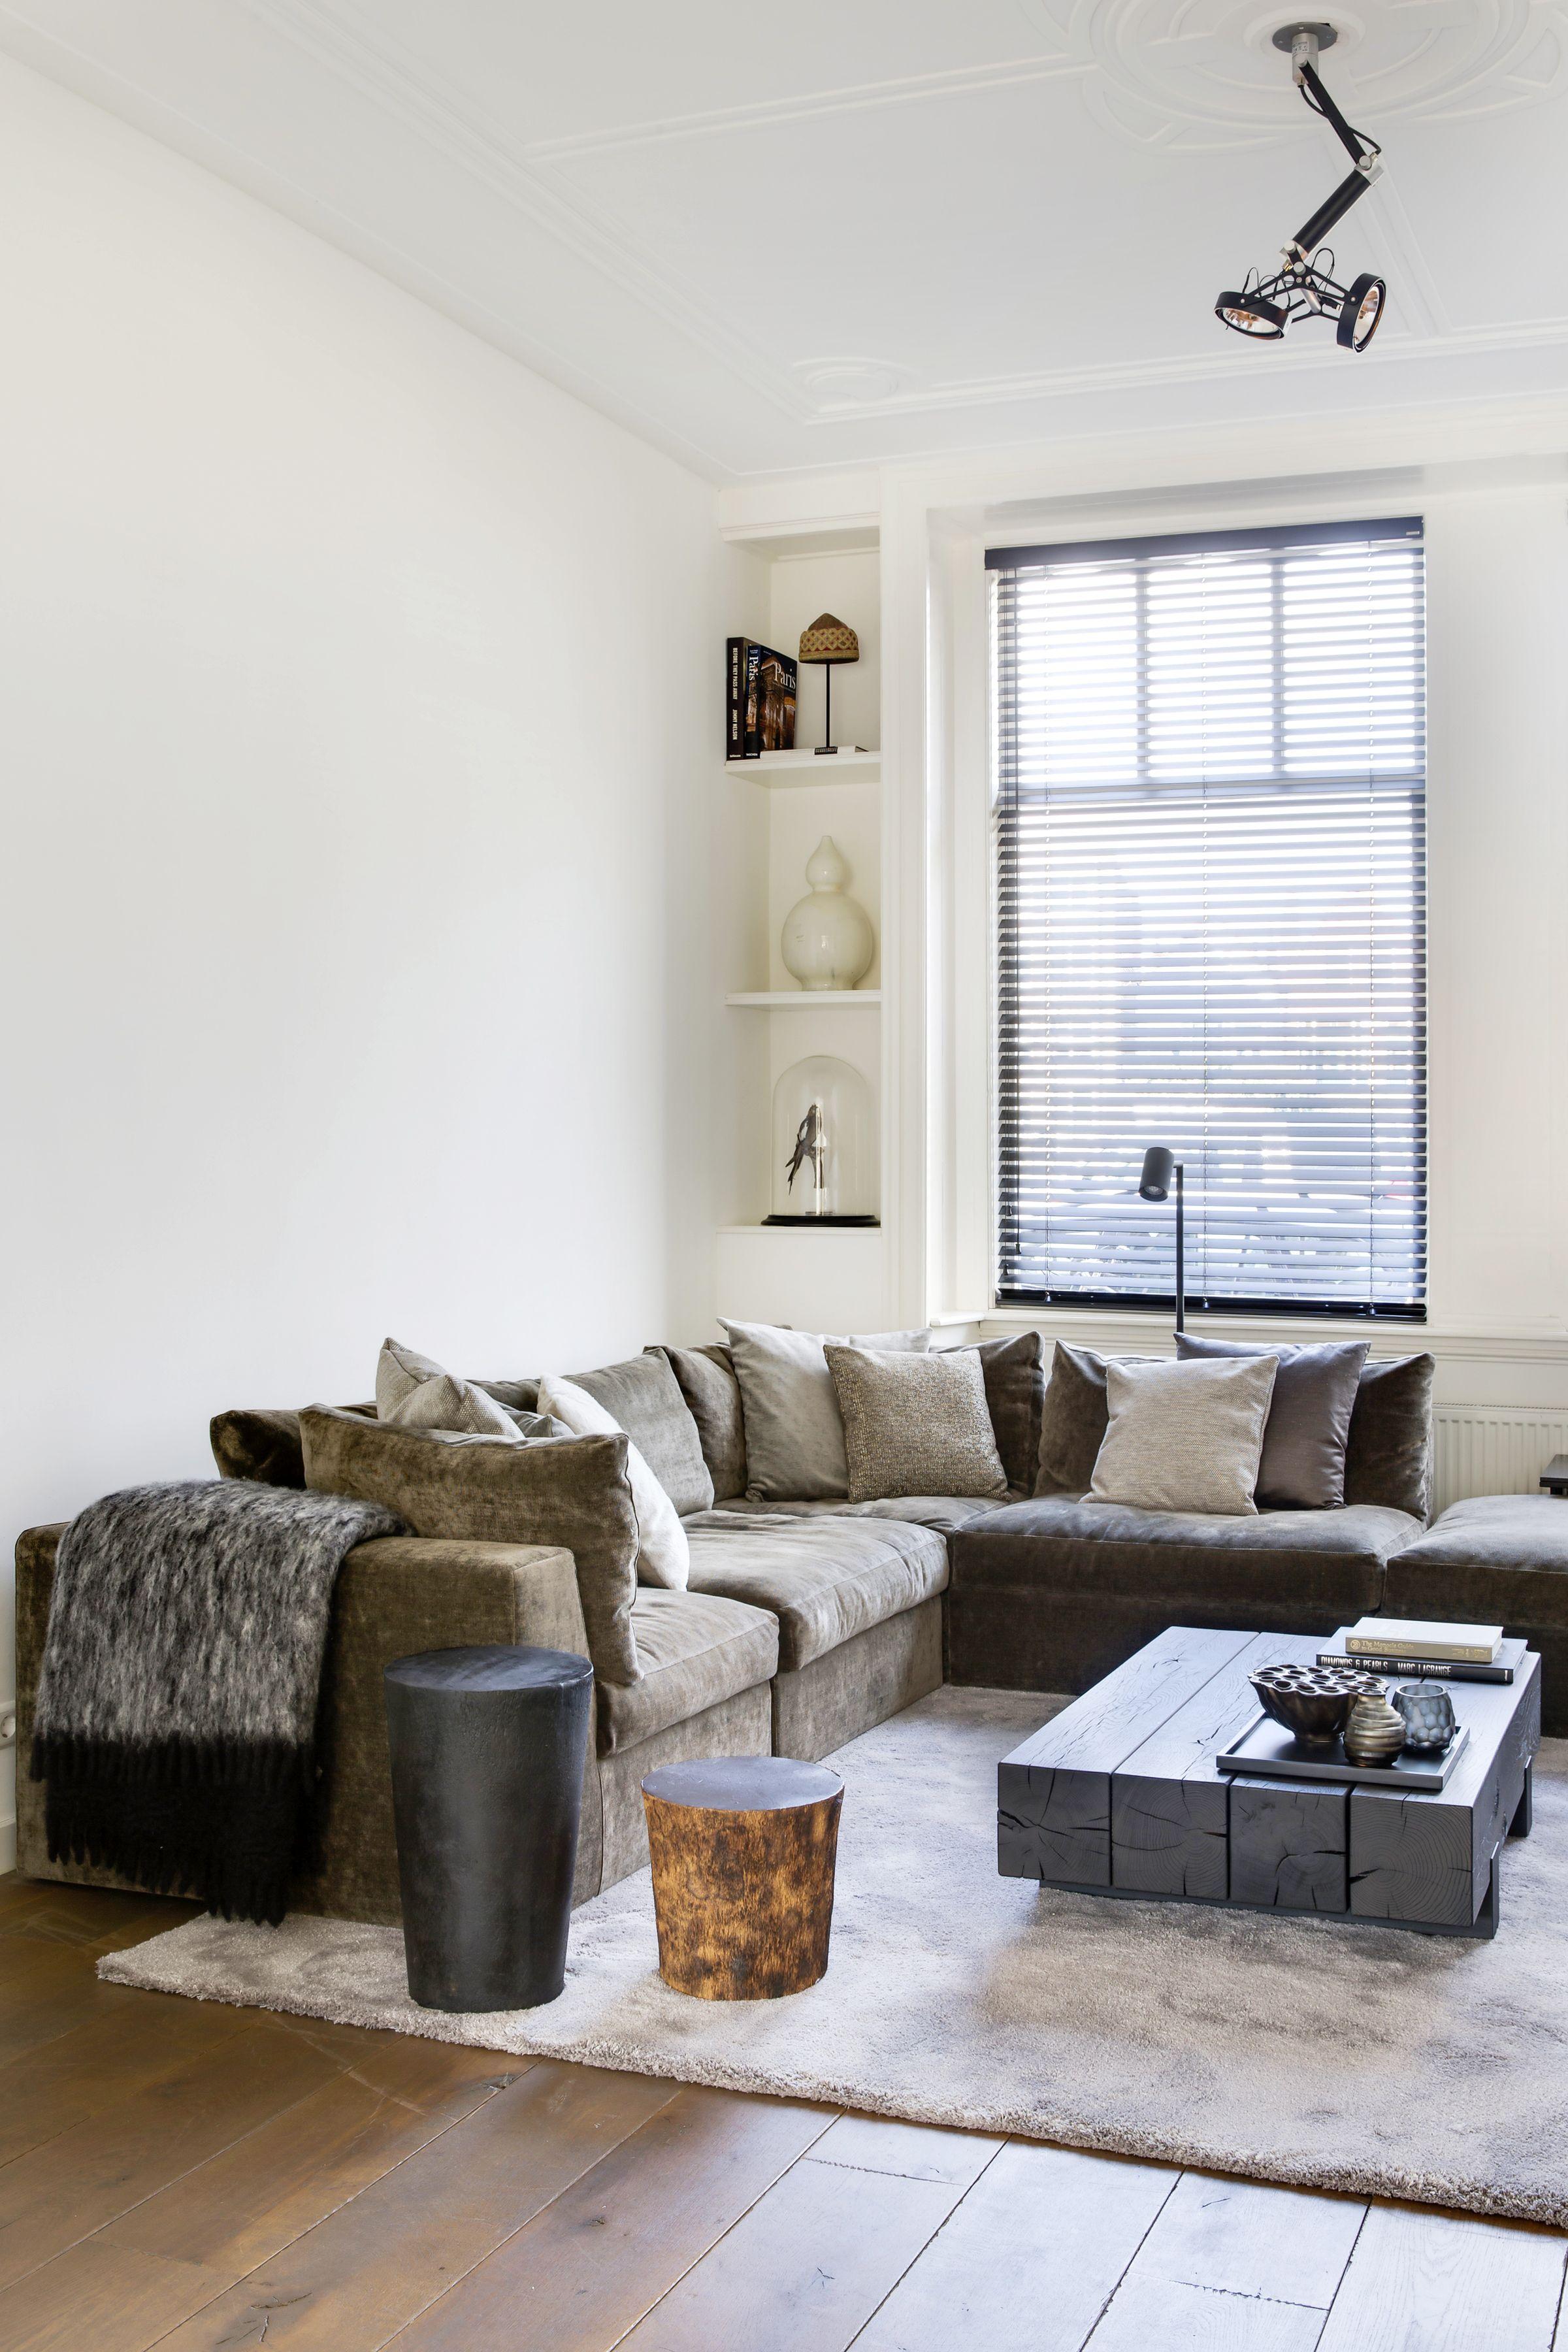 Warme woonkamer met aluminium jaloezieën van Zonnelux. Foto: Denise ...